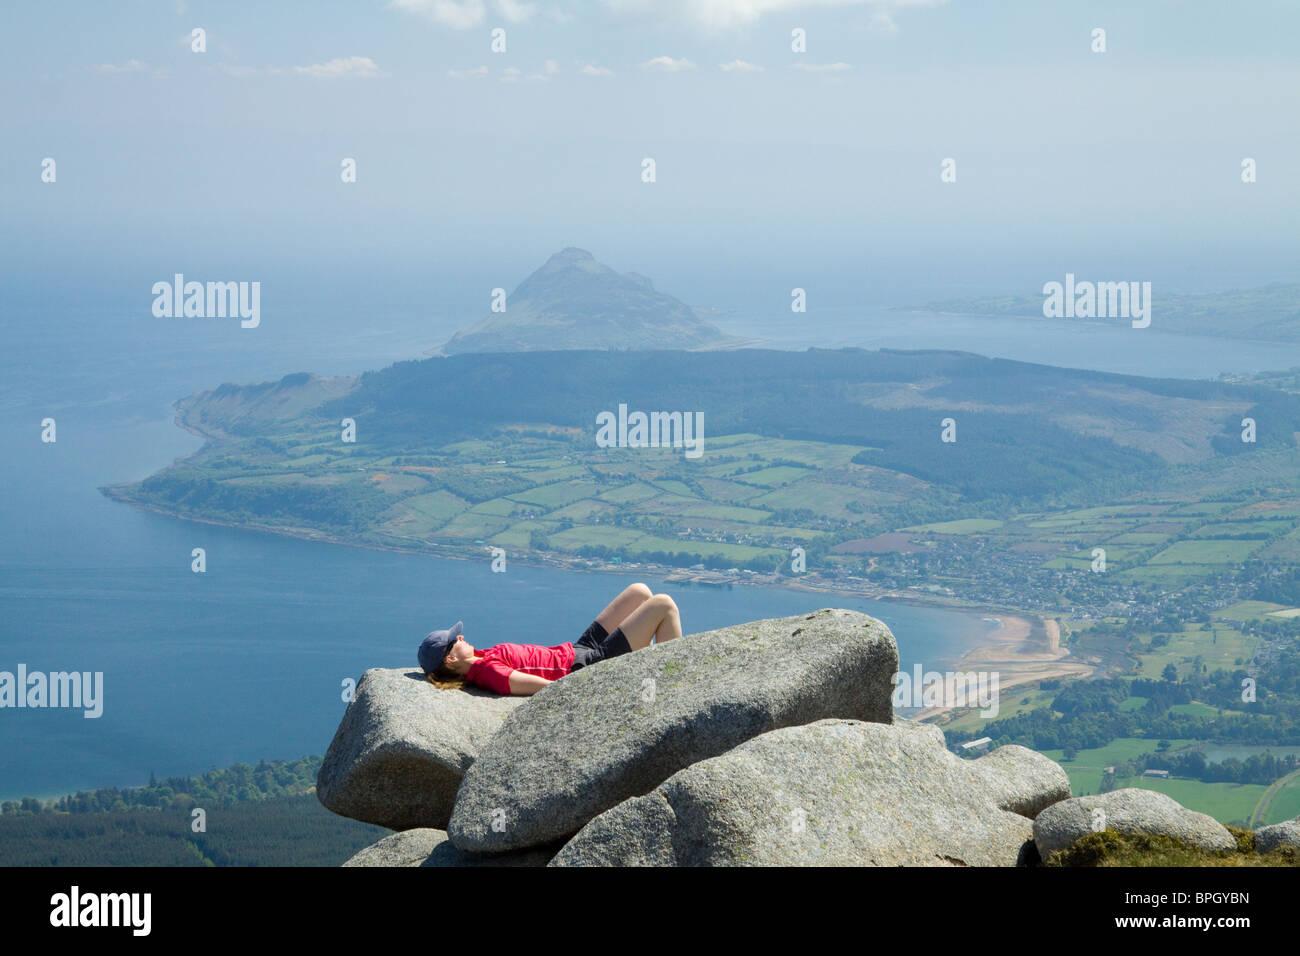 A sunbather on the summit of Goatfell, Isle of Arran, Scotland - Stock Image